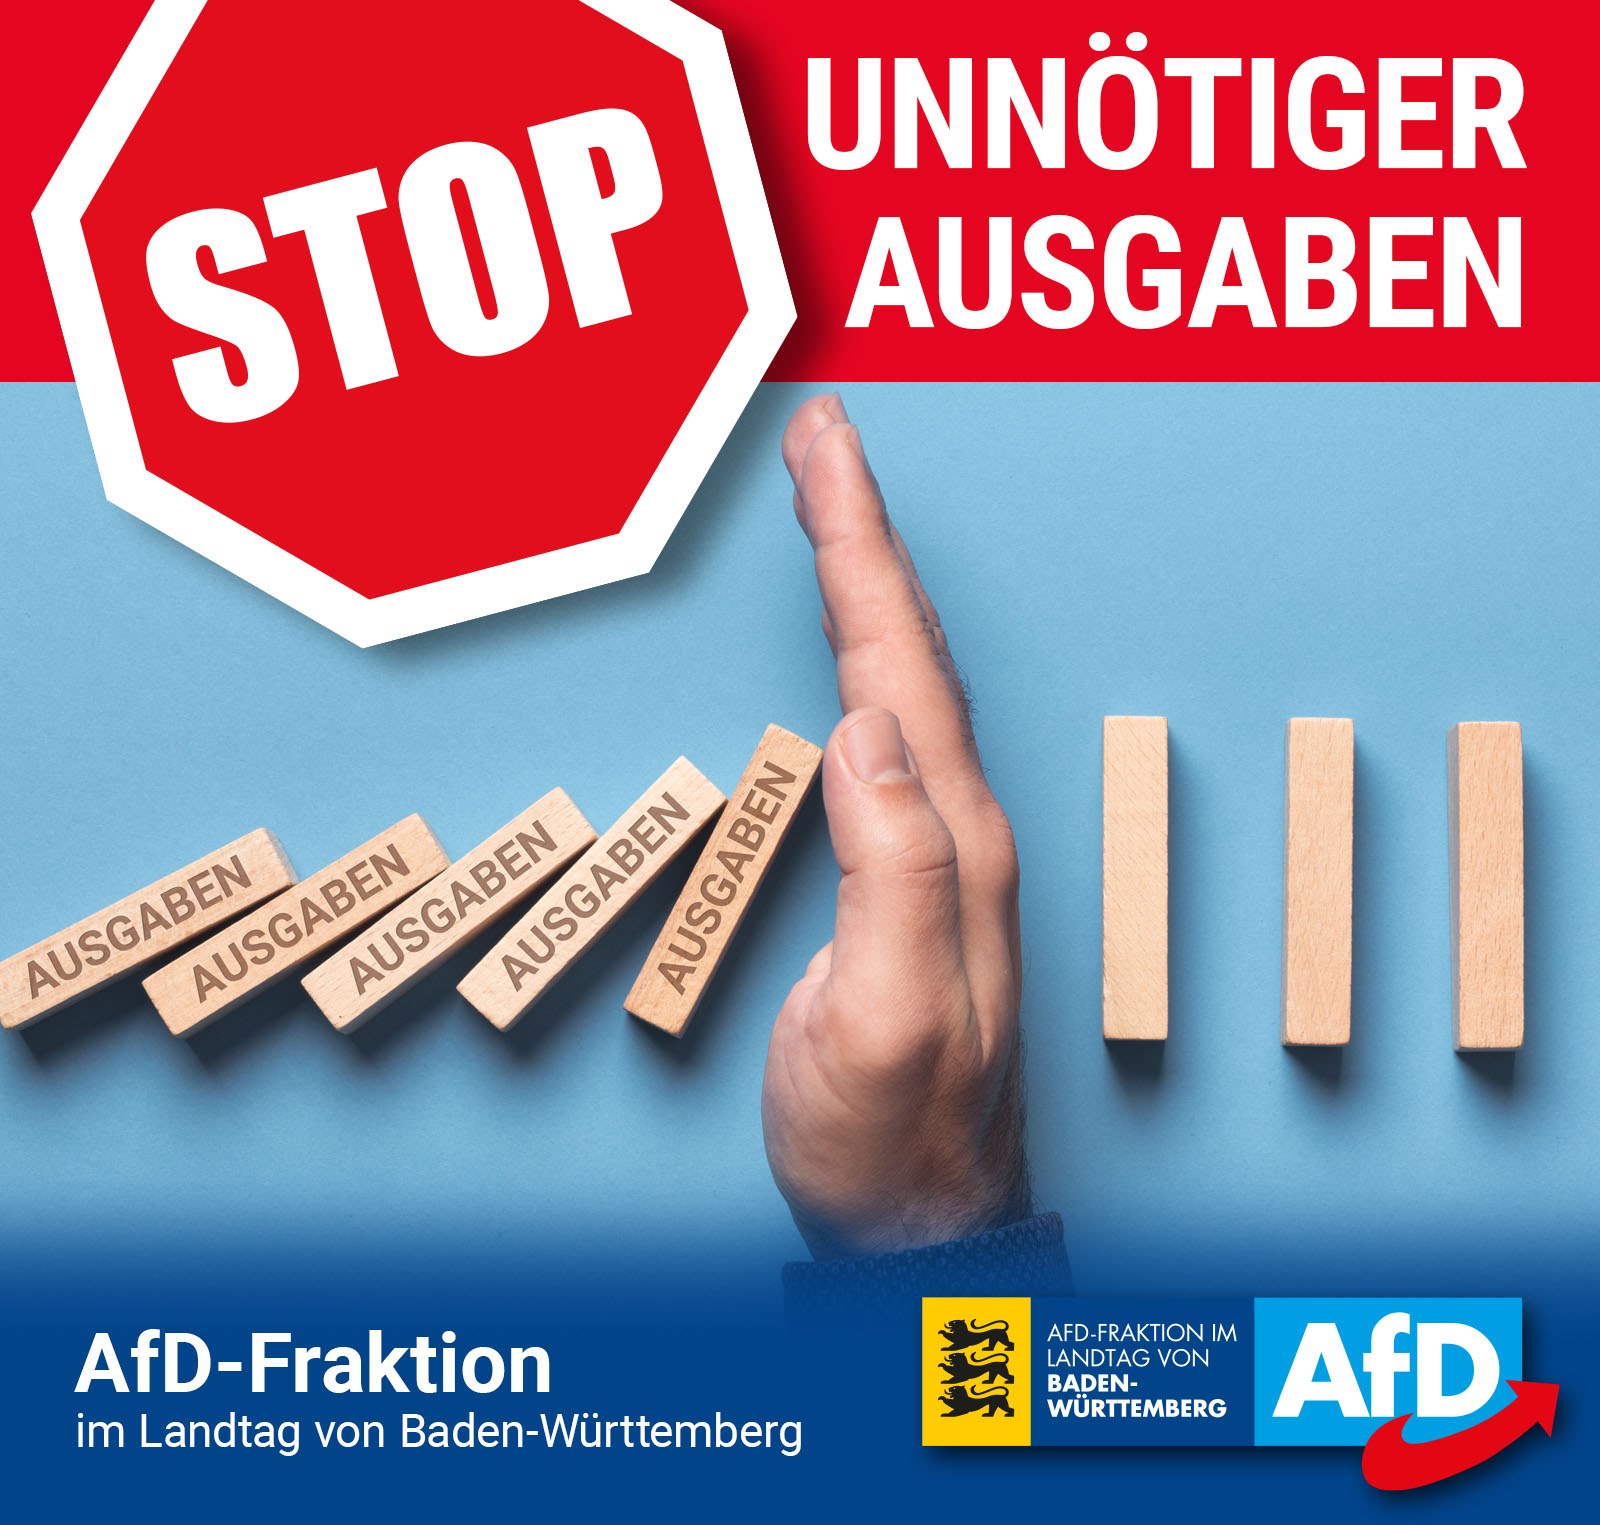 AfD-Fraktion will Haushaltssperre